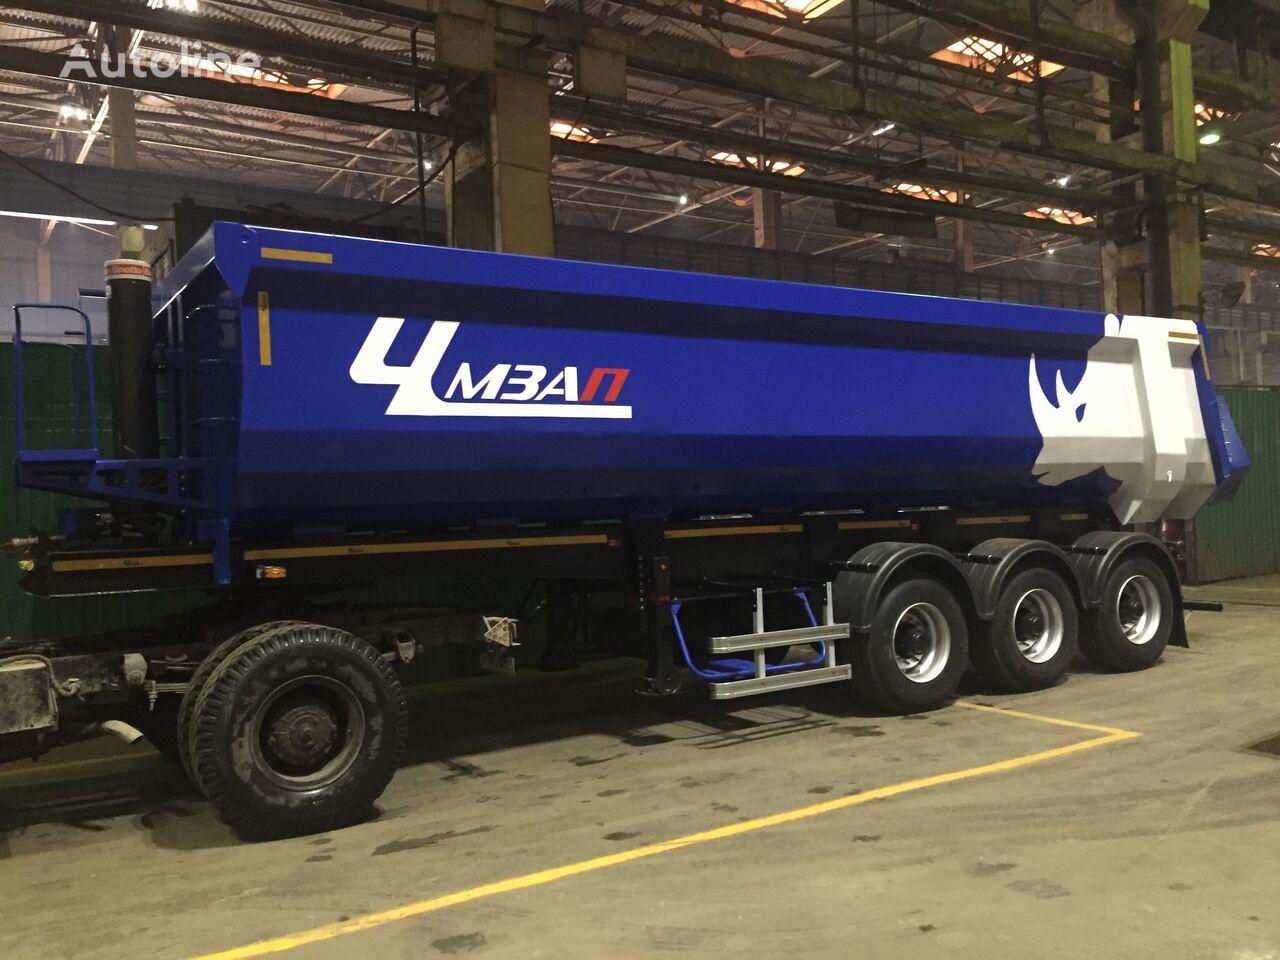 new CHMZAP 9520-022-PPCh tipper semi-trailer